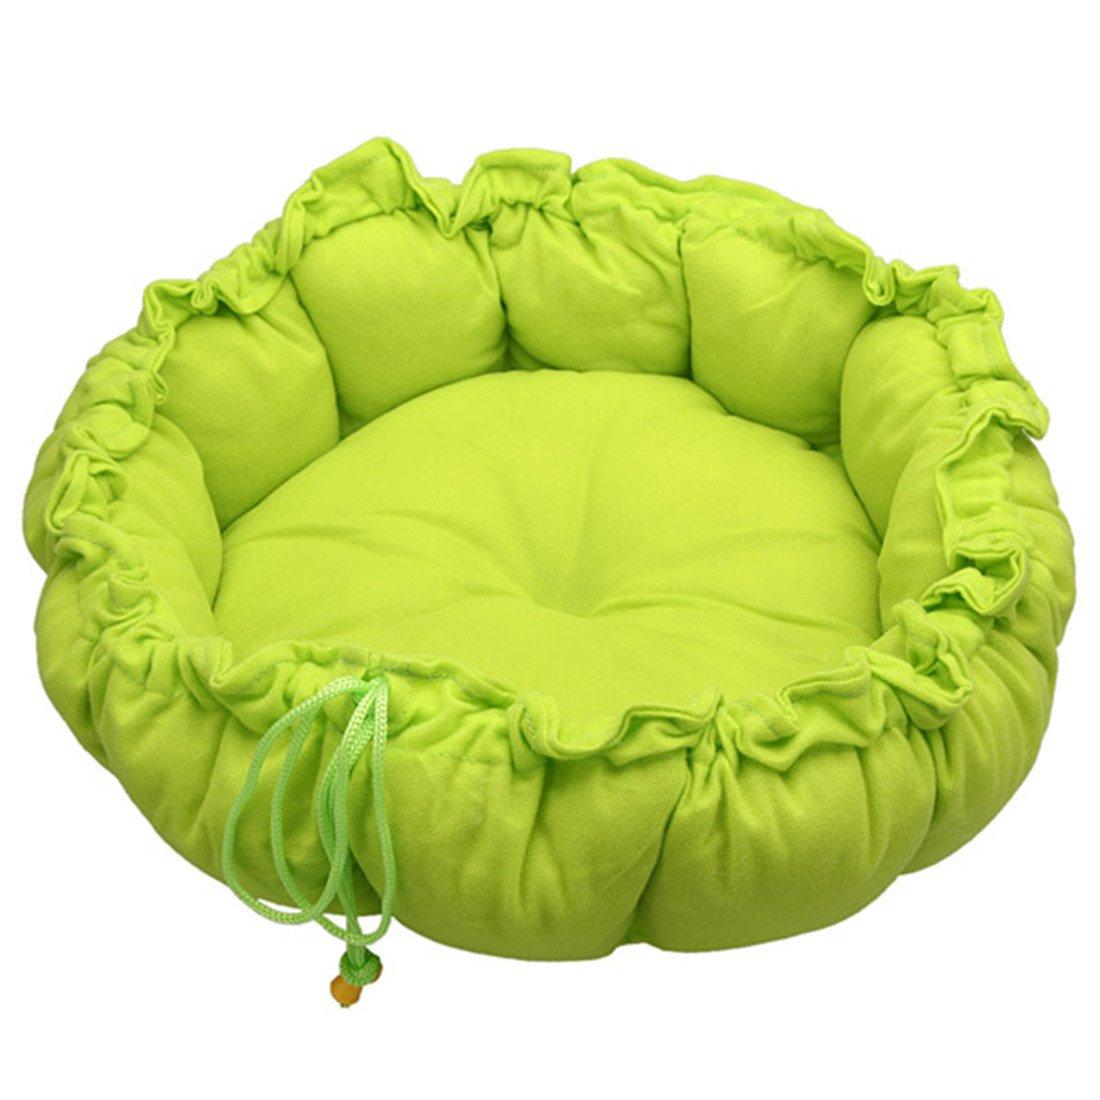 Mascota Perro Gato Cama blanda perro caliente cesta perro cama - Productos animales